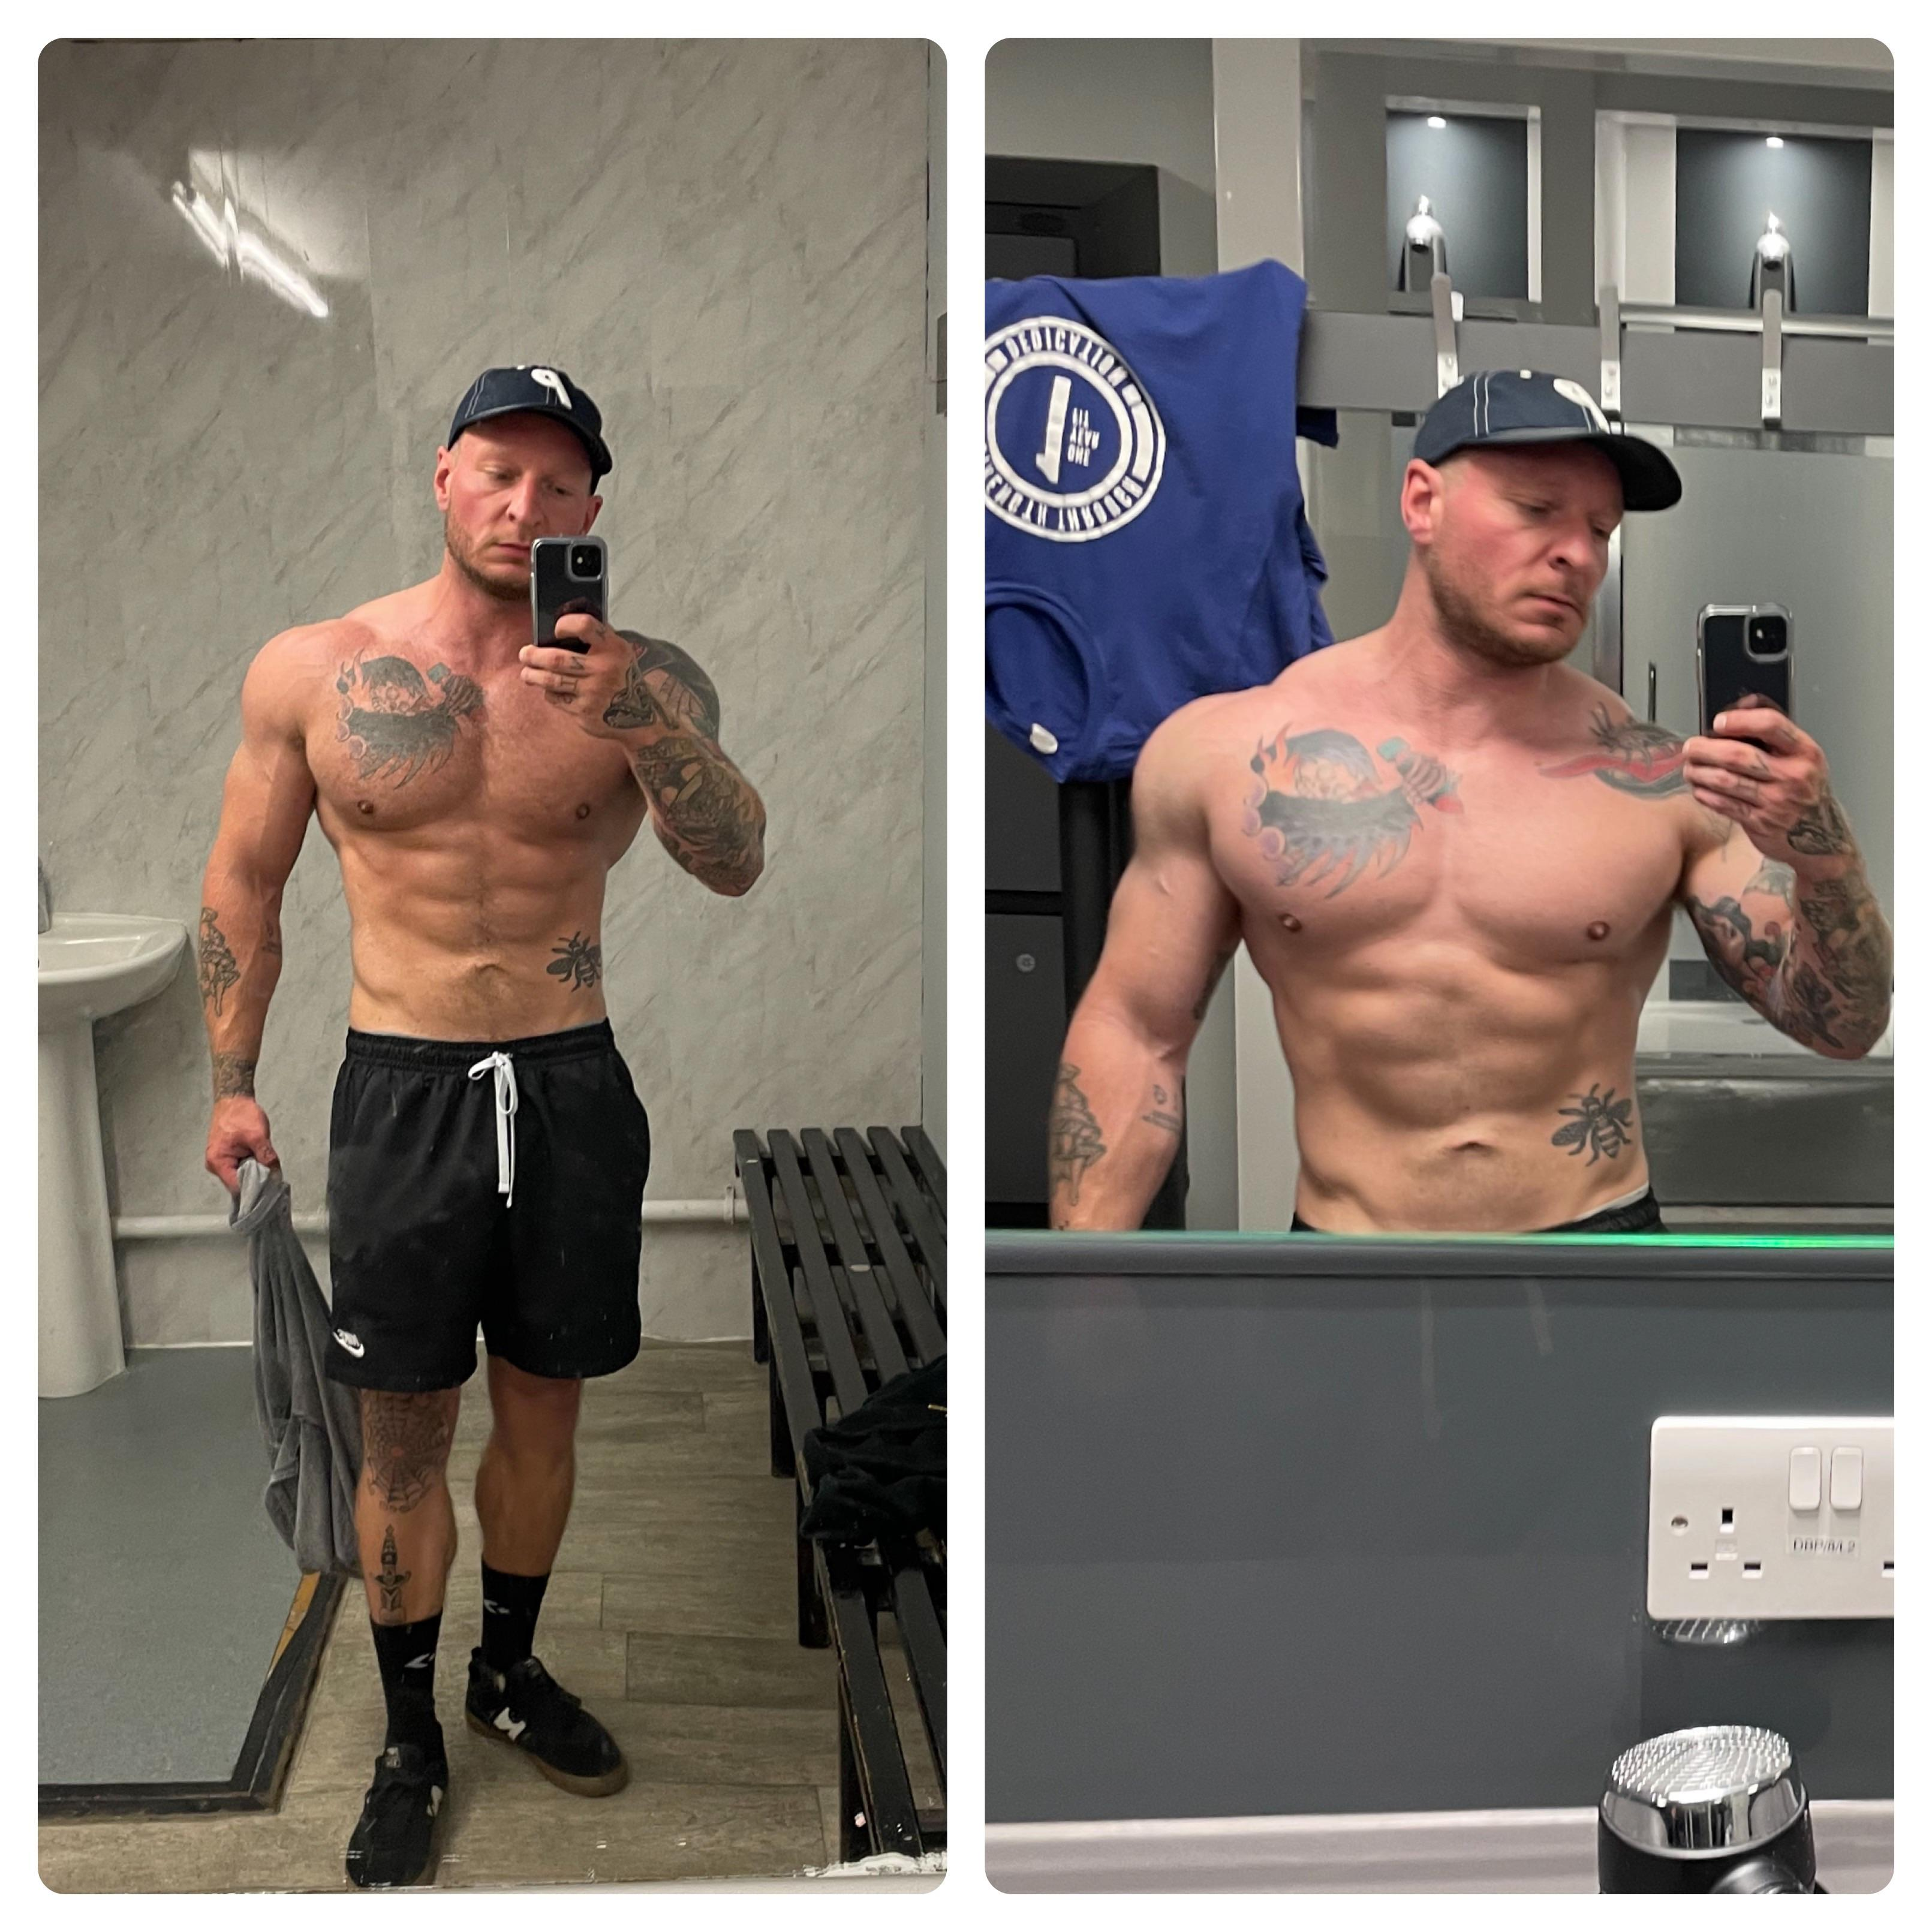 Progress Pics of 20 lbs Weight Gain 5'9 Male 180 lbs to 200 lbs